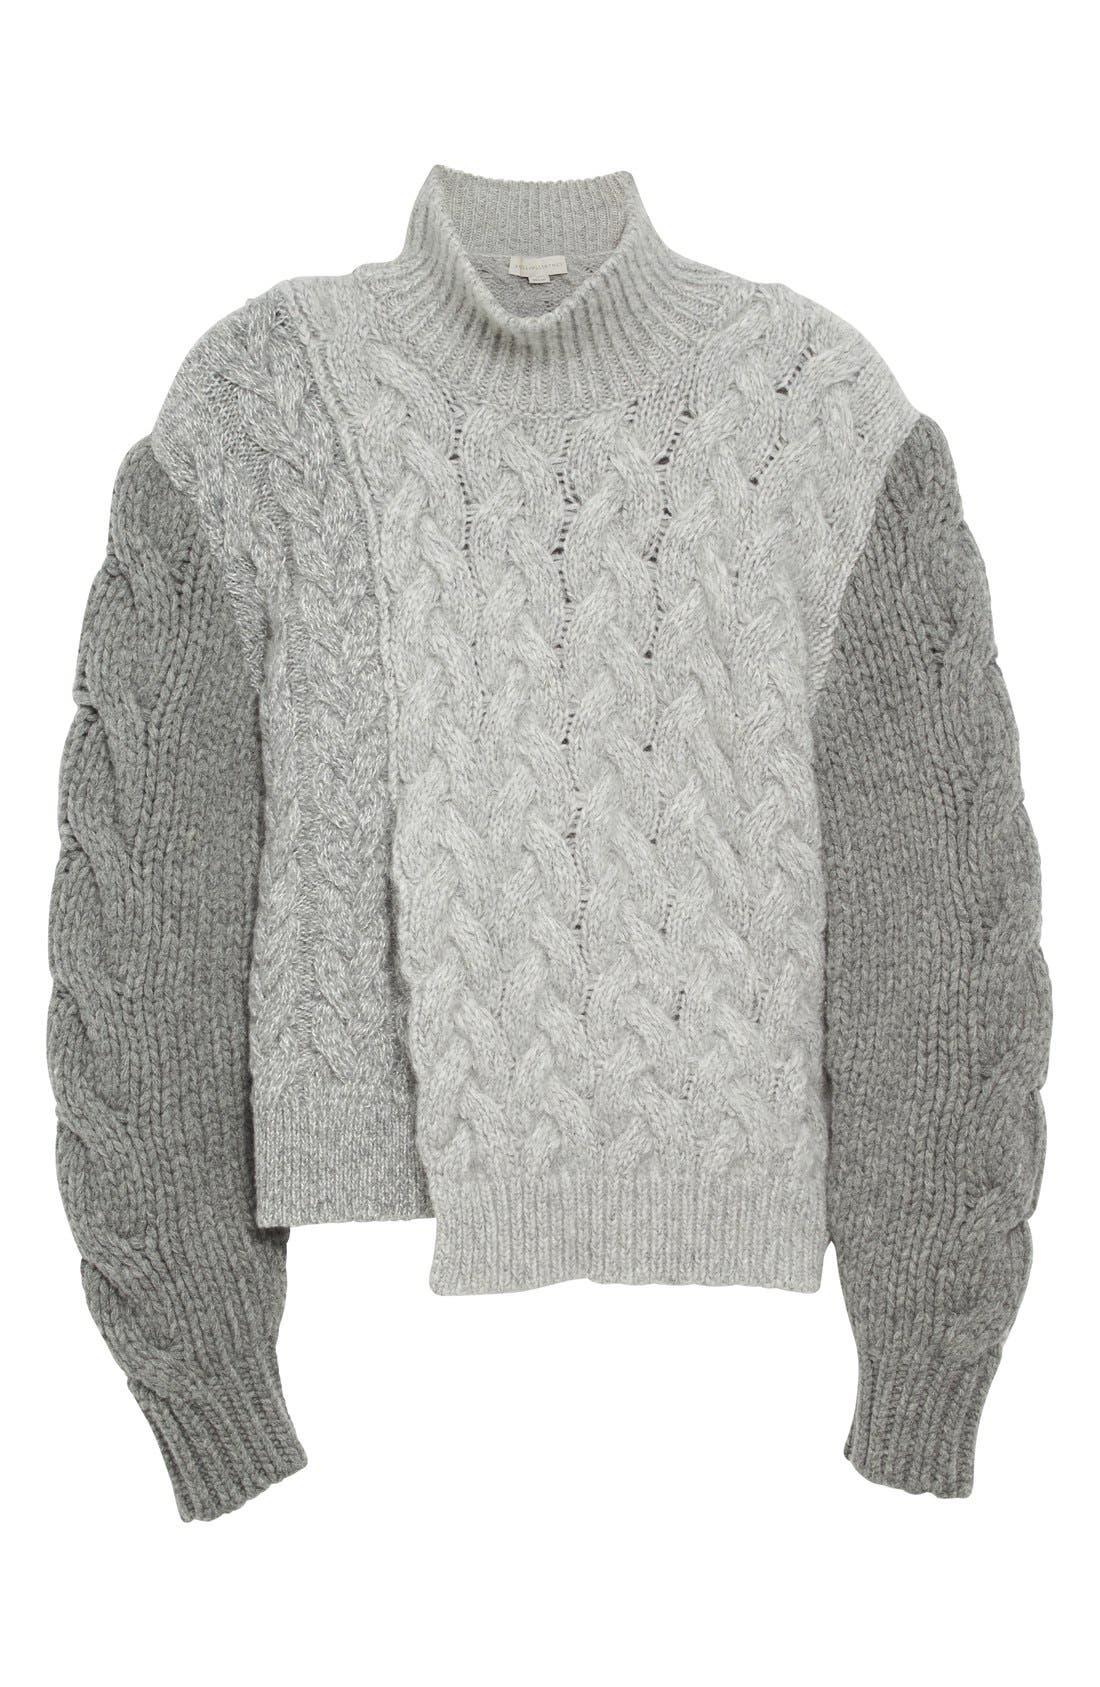 STELLA MCCARTNEY, Mixed Media Turtleneck Sweater, Alternate thumbnail 4, color, 120